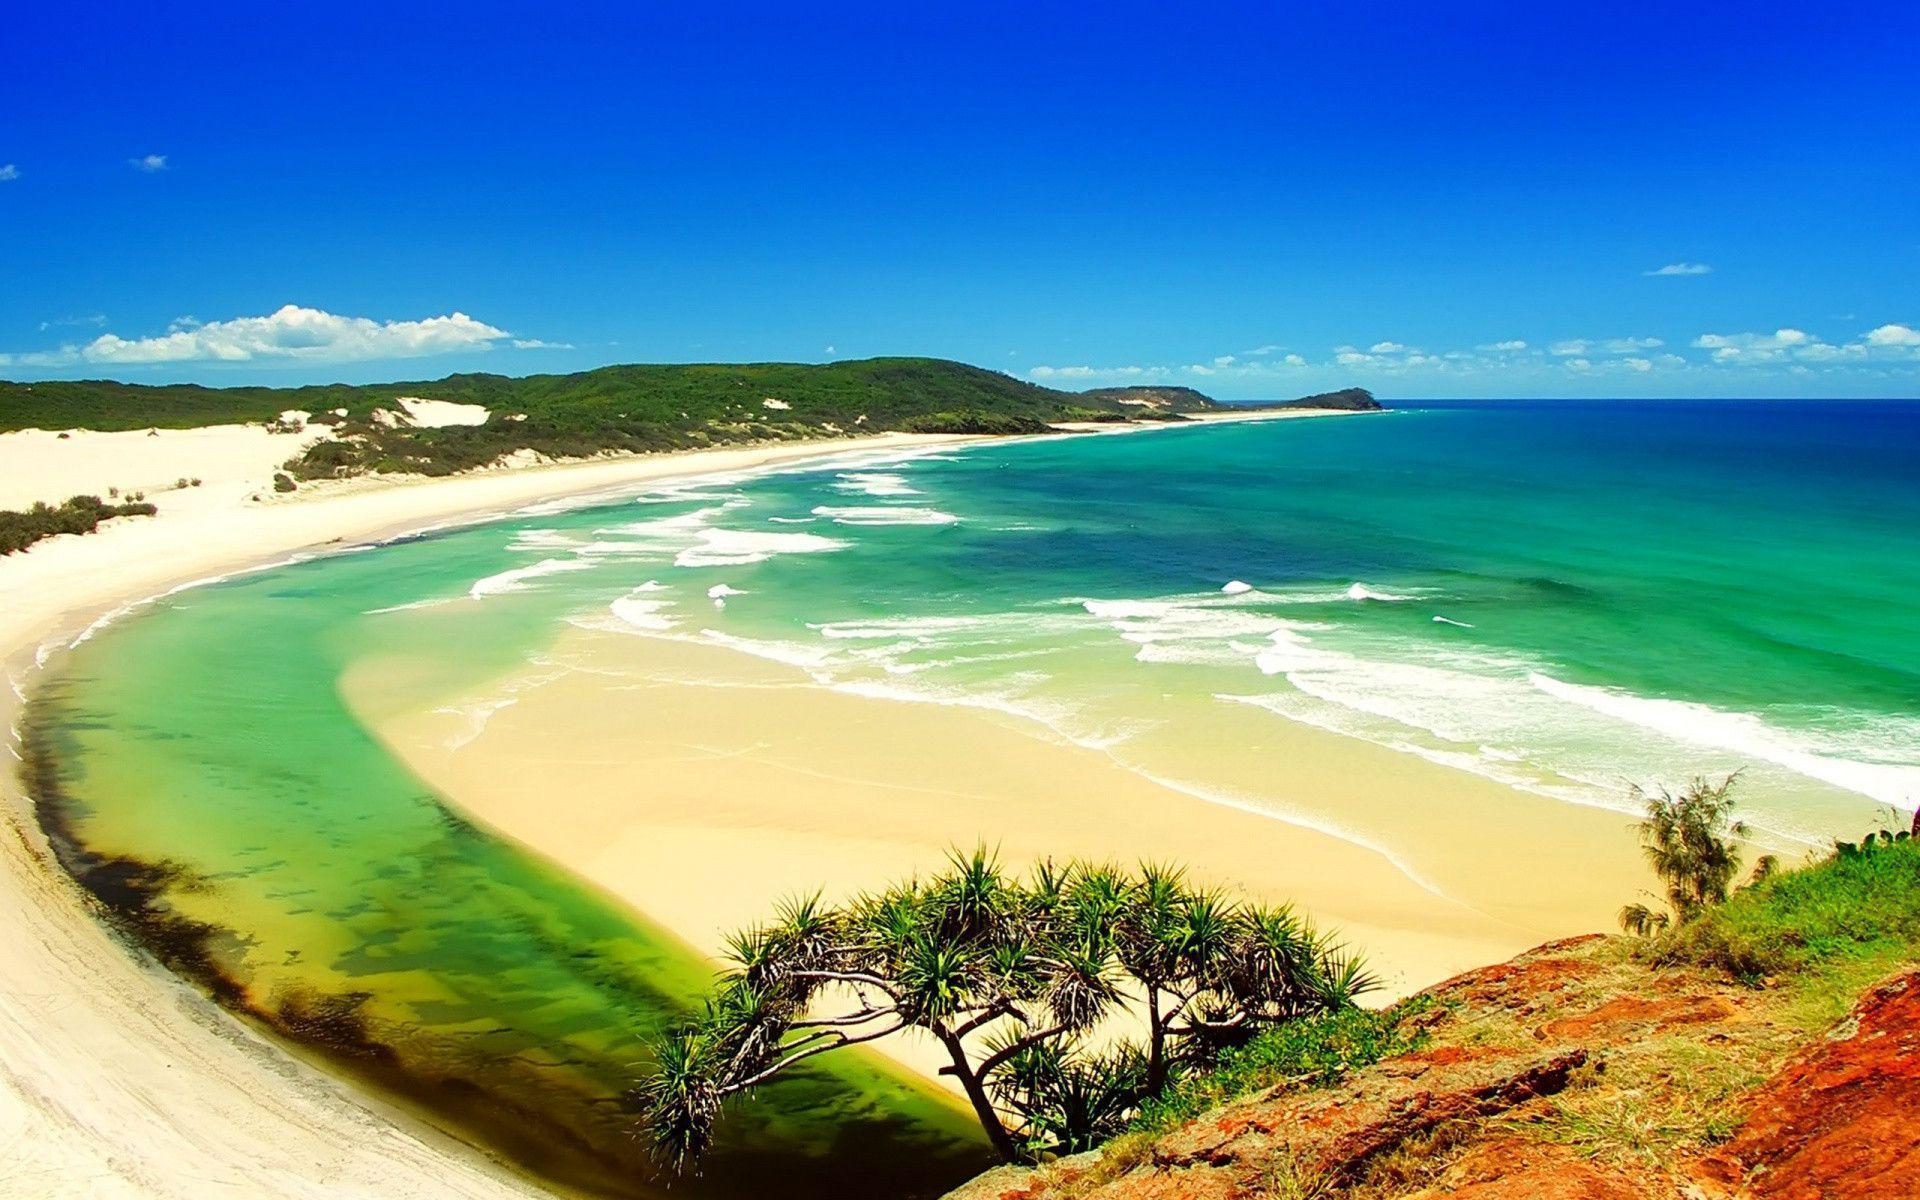 Beautiful Nature Summer Hd Desktop 9 HD Wallpapers